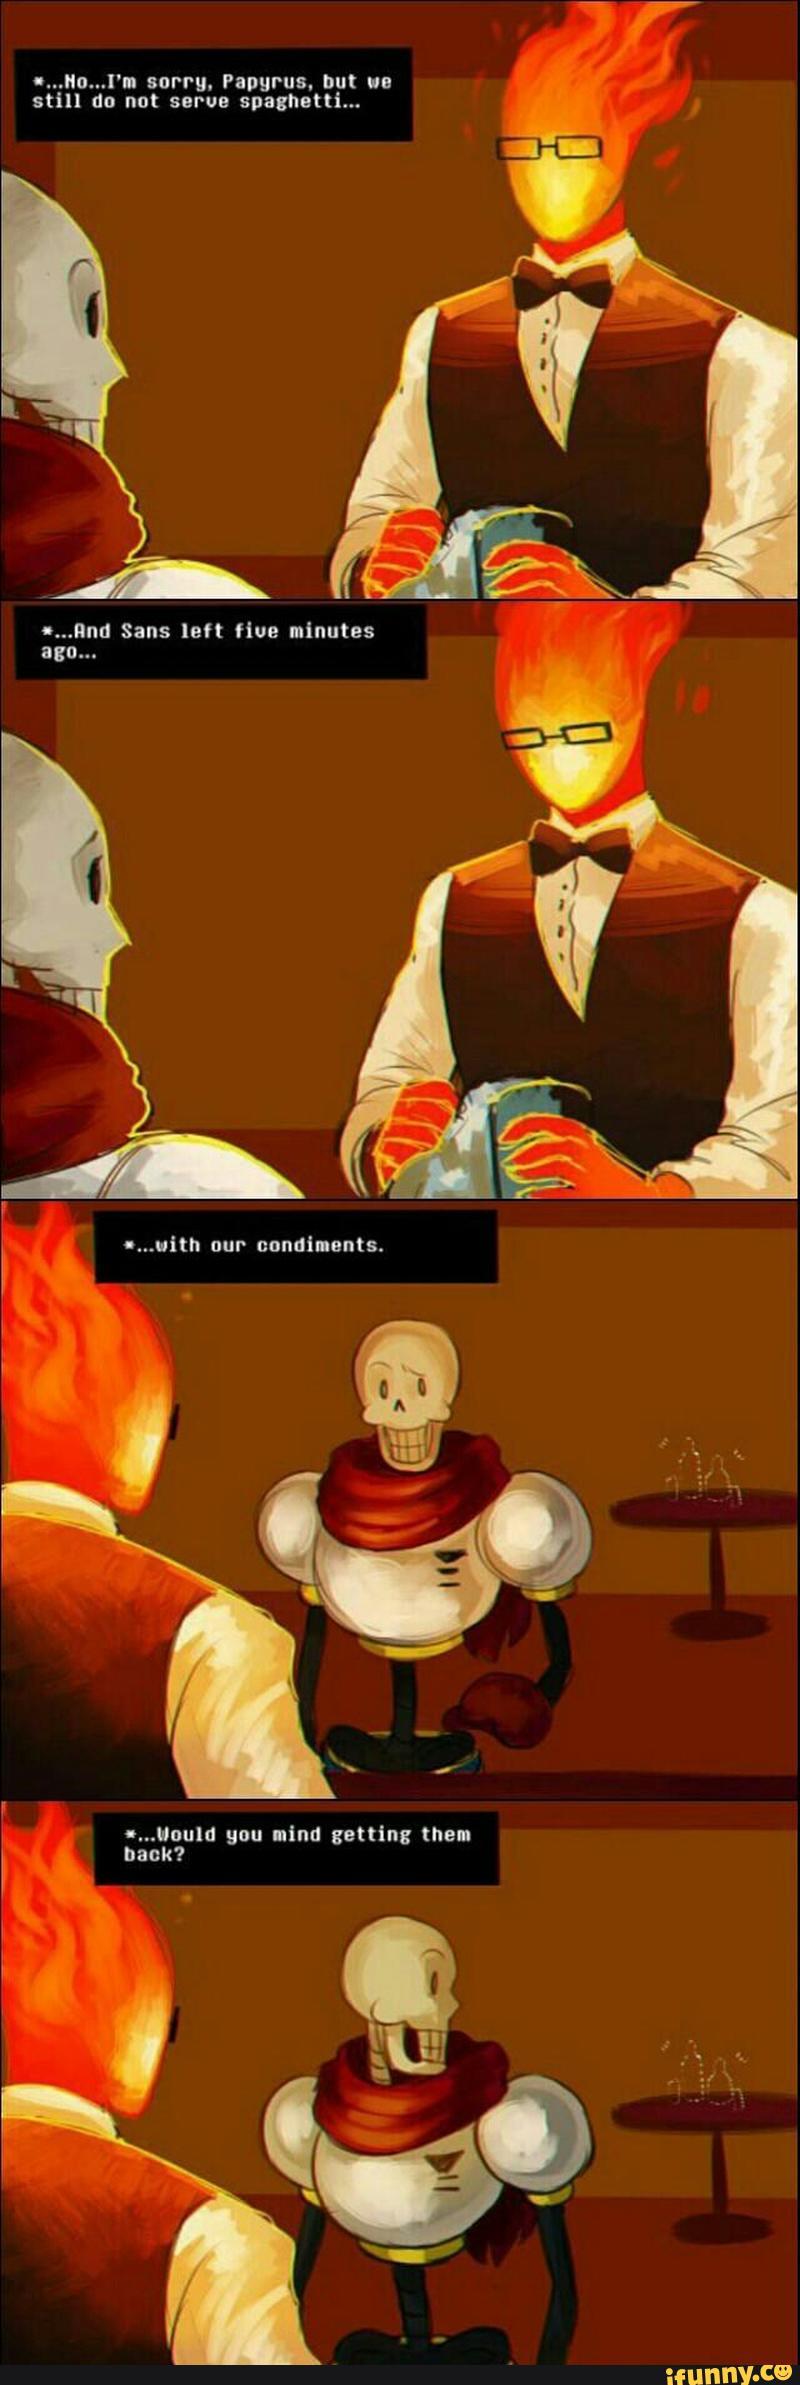 undertale, grillby, papyrus Undertale memes, Undertale